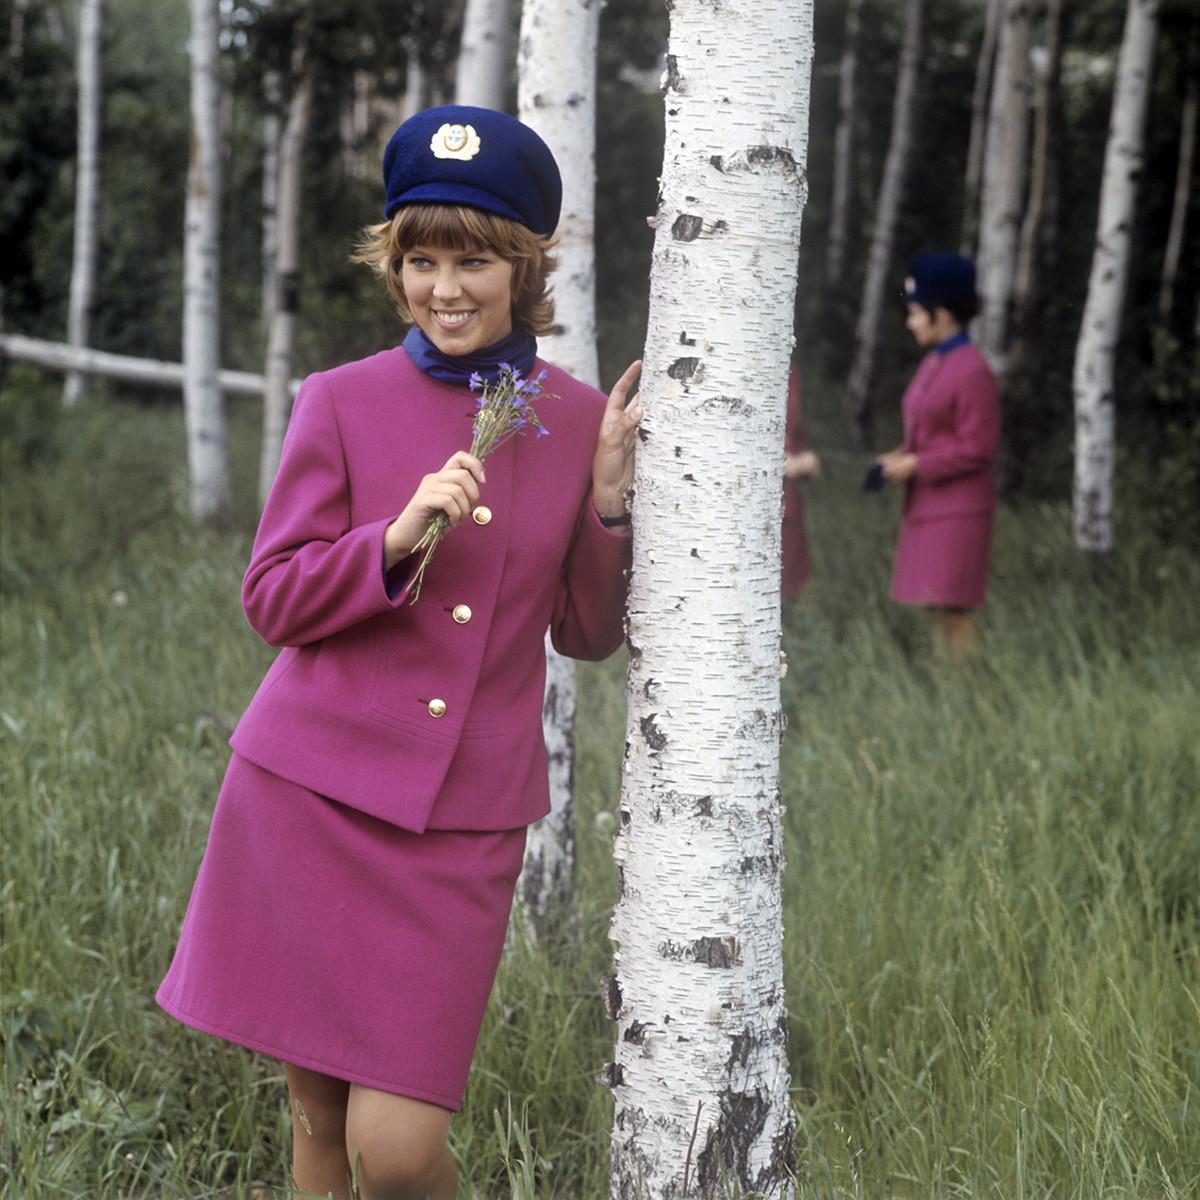 Auxiliar de vuelo Nadezhda Tkach.